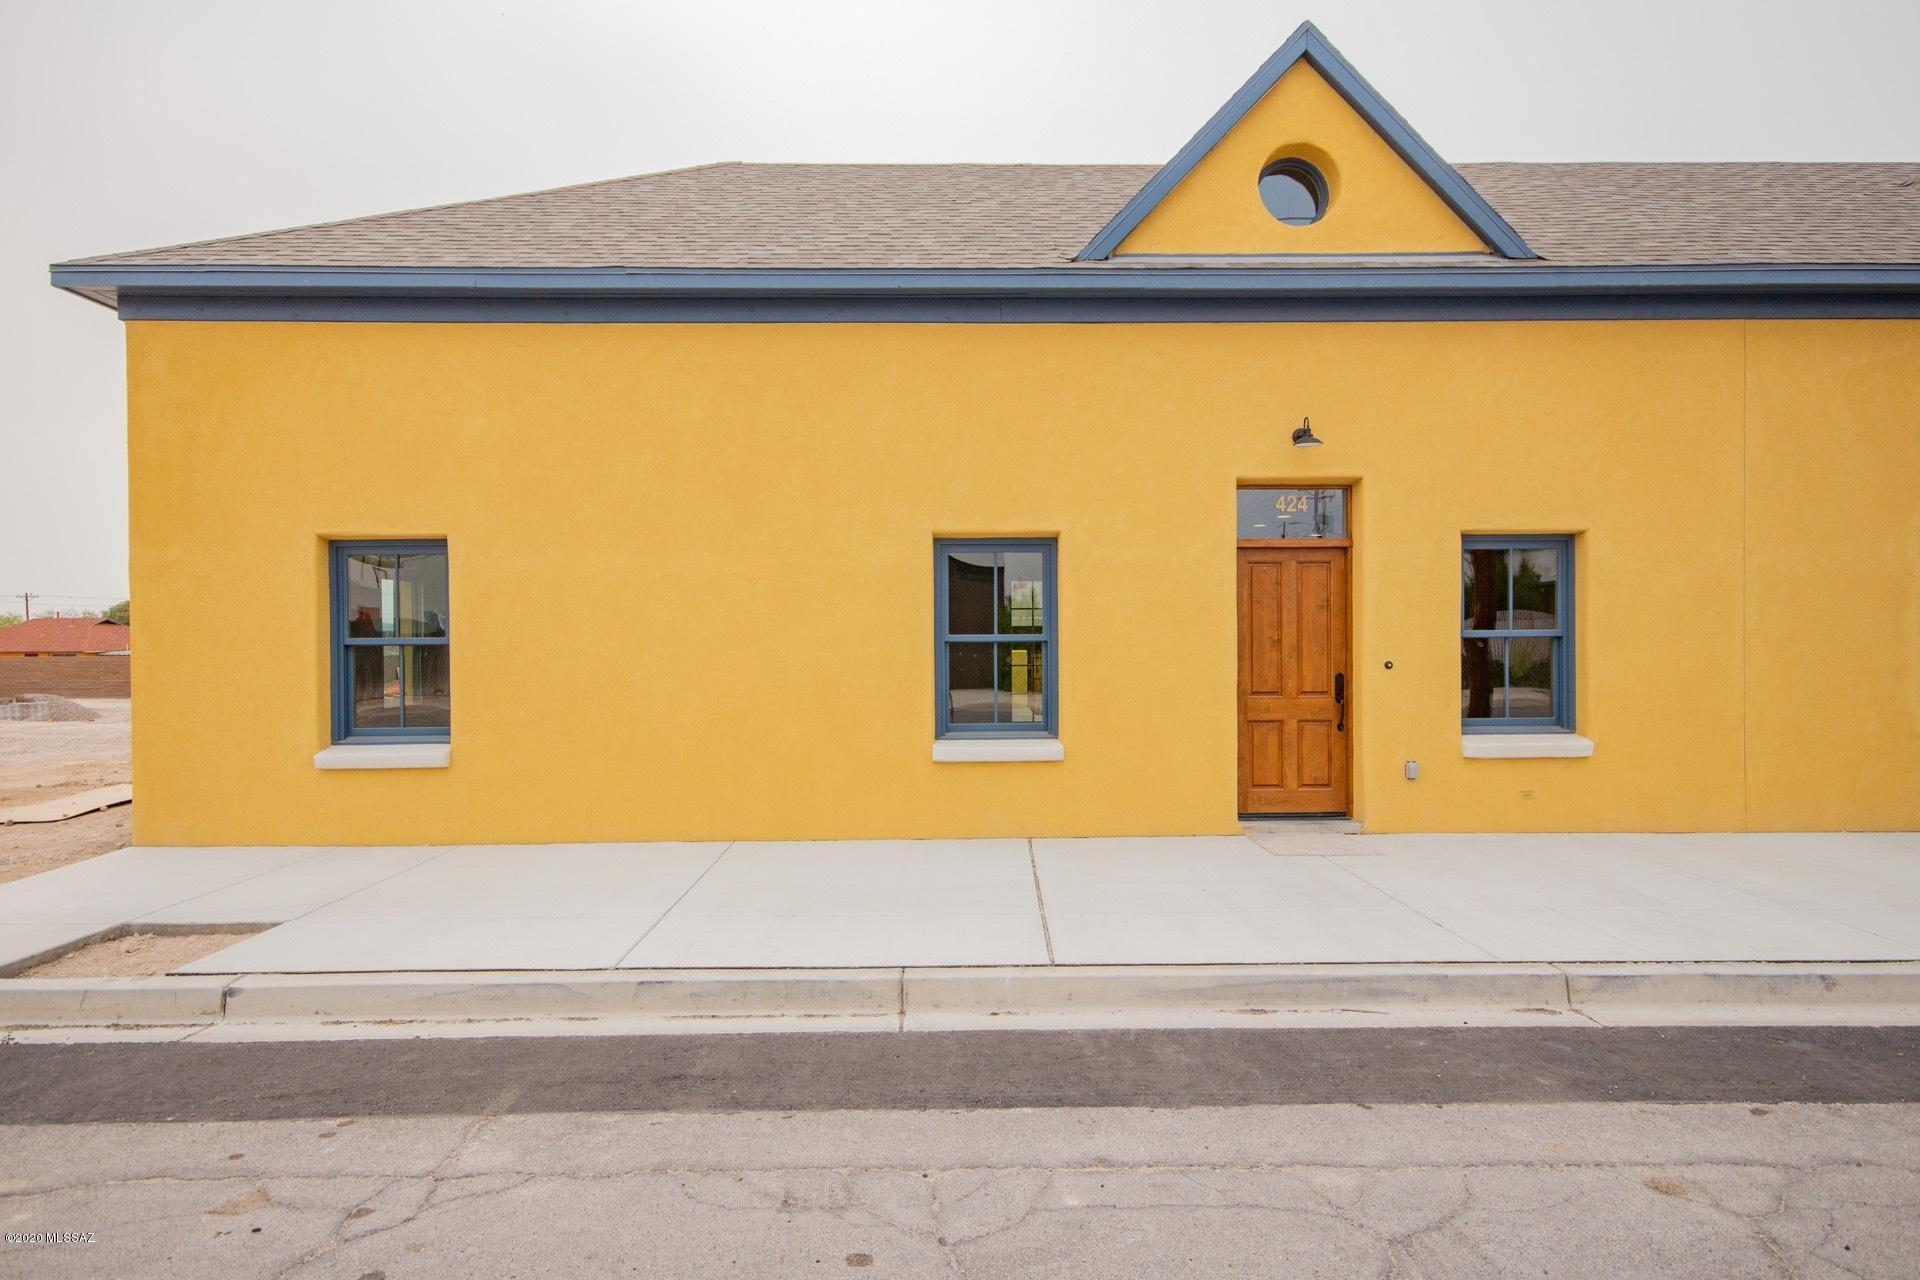 Photo of 424 S Meyer Avenue, Tucson, AZ 85701